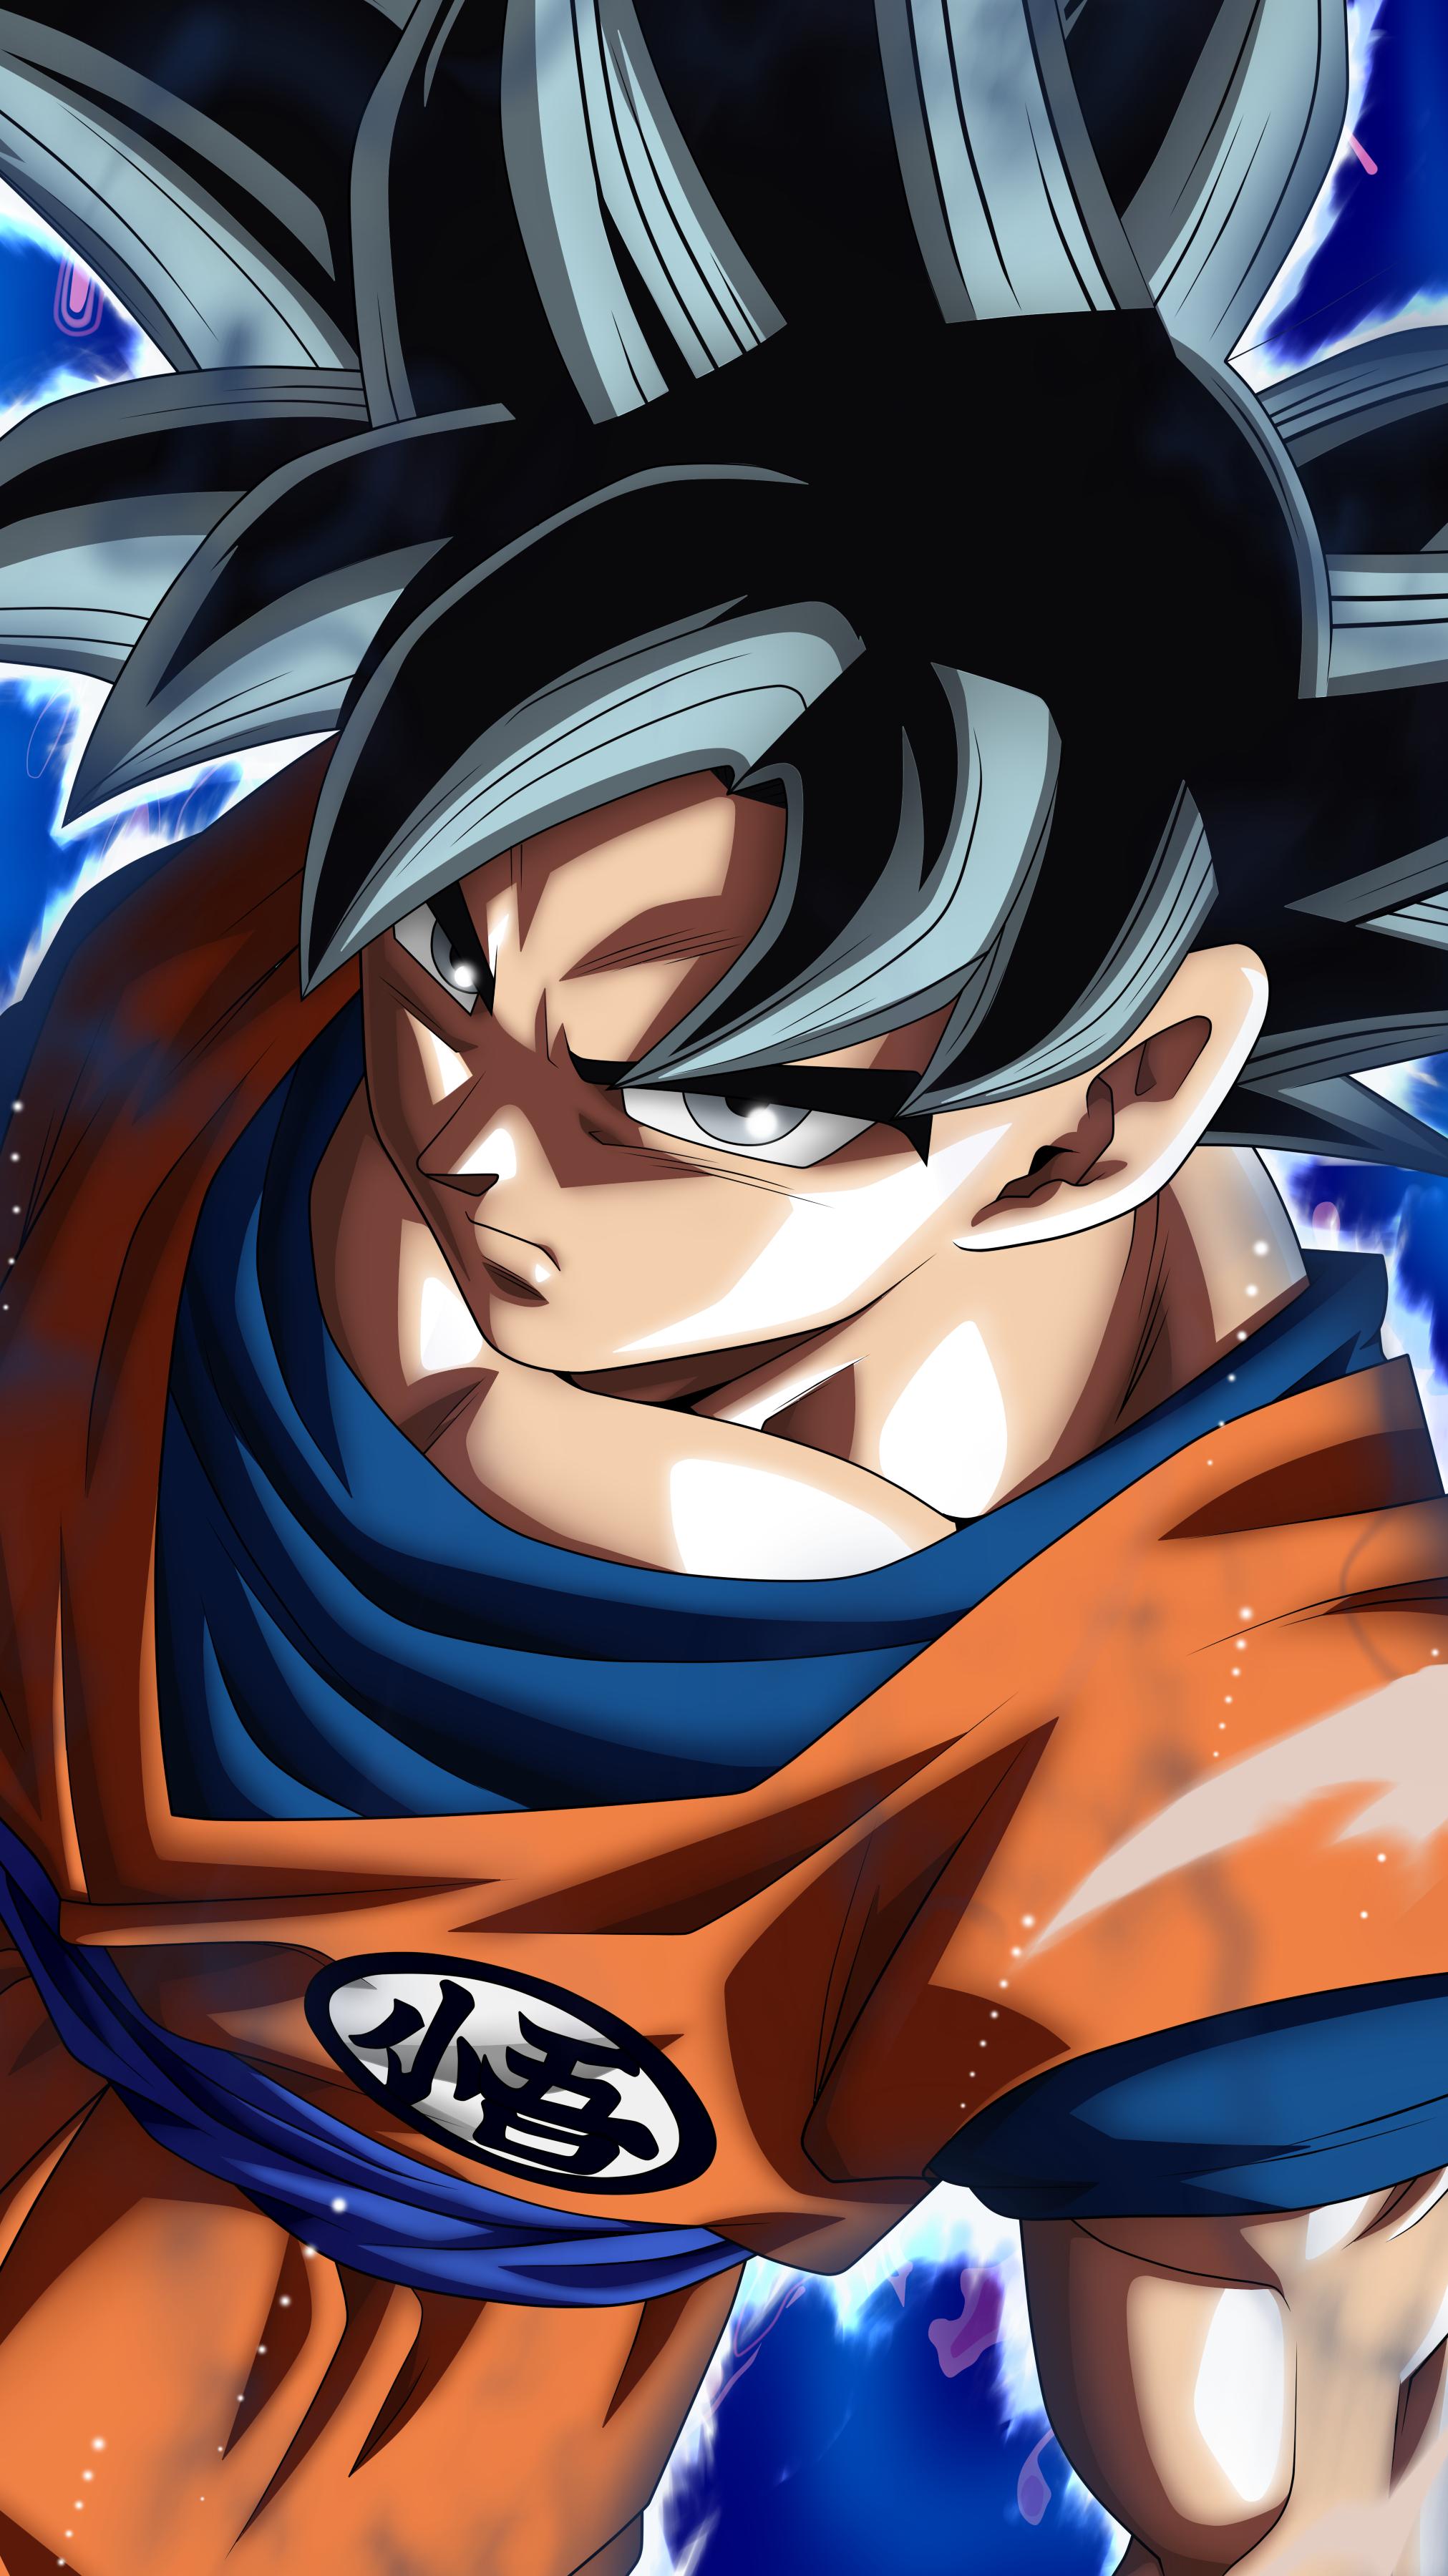 Best Wallpaper Naruto Savage - c3d5859b46322da5915c33ea0db6c4e9  Image.png